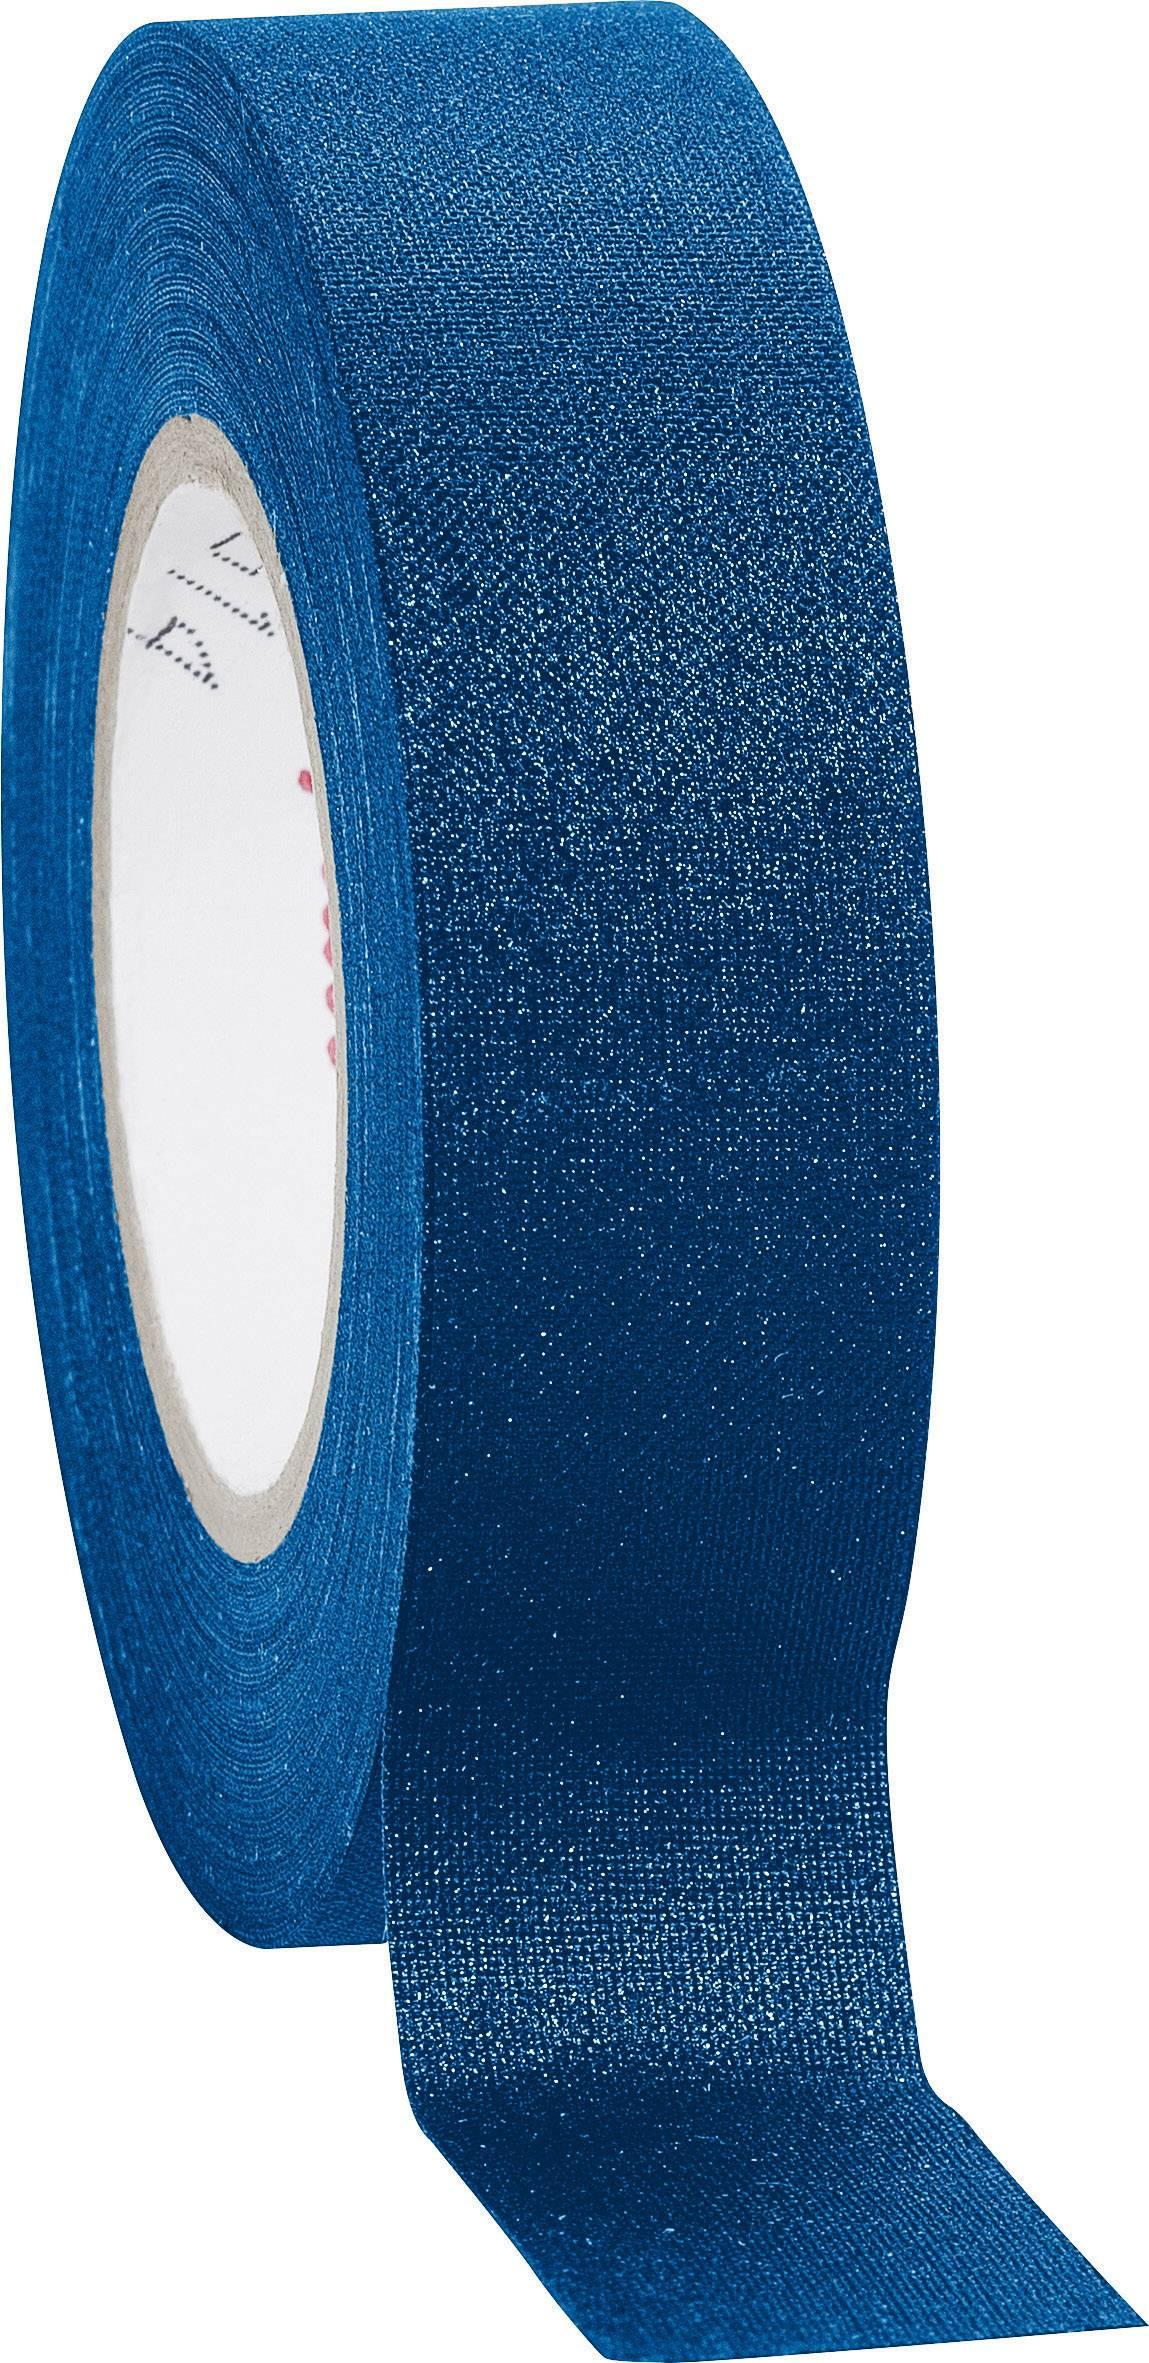 Páska so skleným vláknom Coroplast 39758 39758, (d x š) 10 m x 19 mm, modrá, 1 roliek